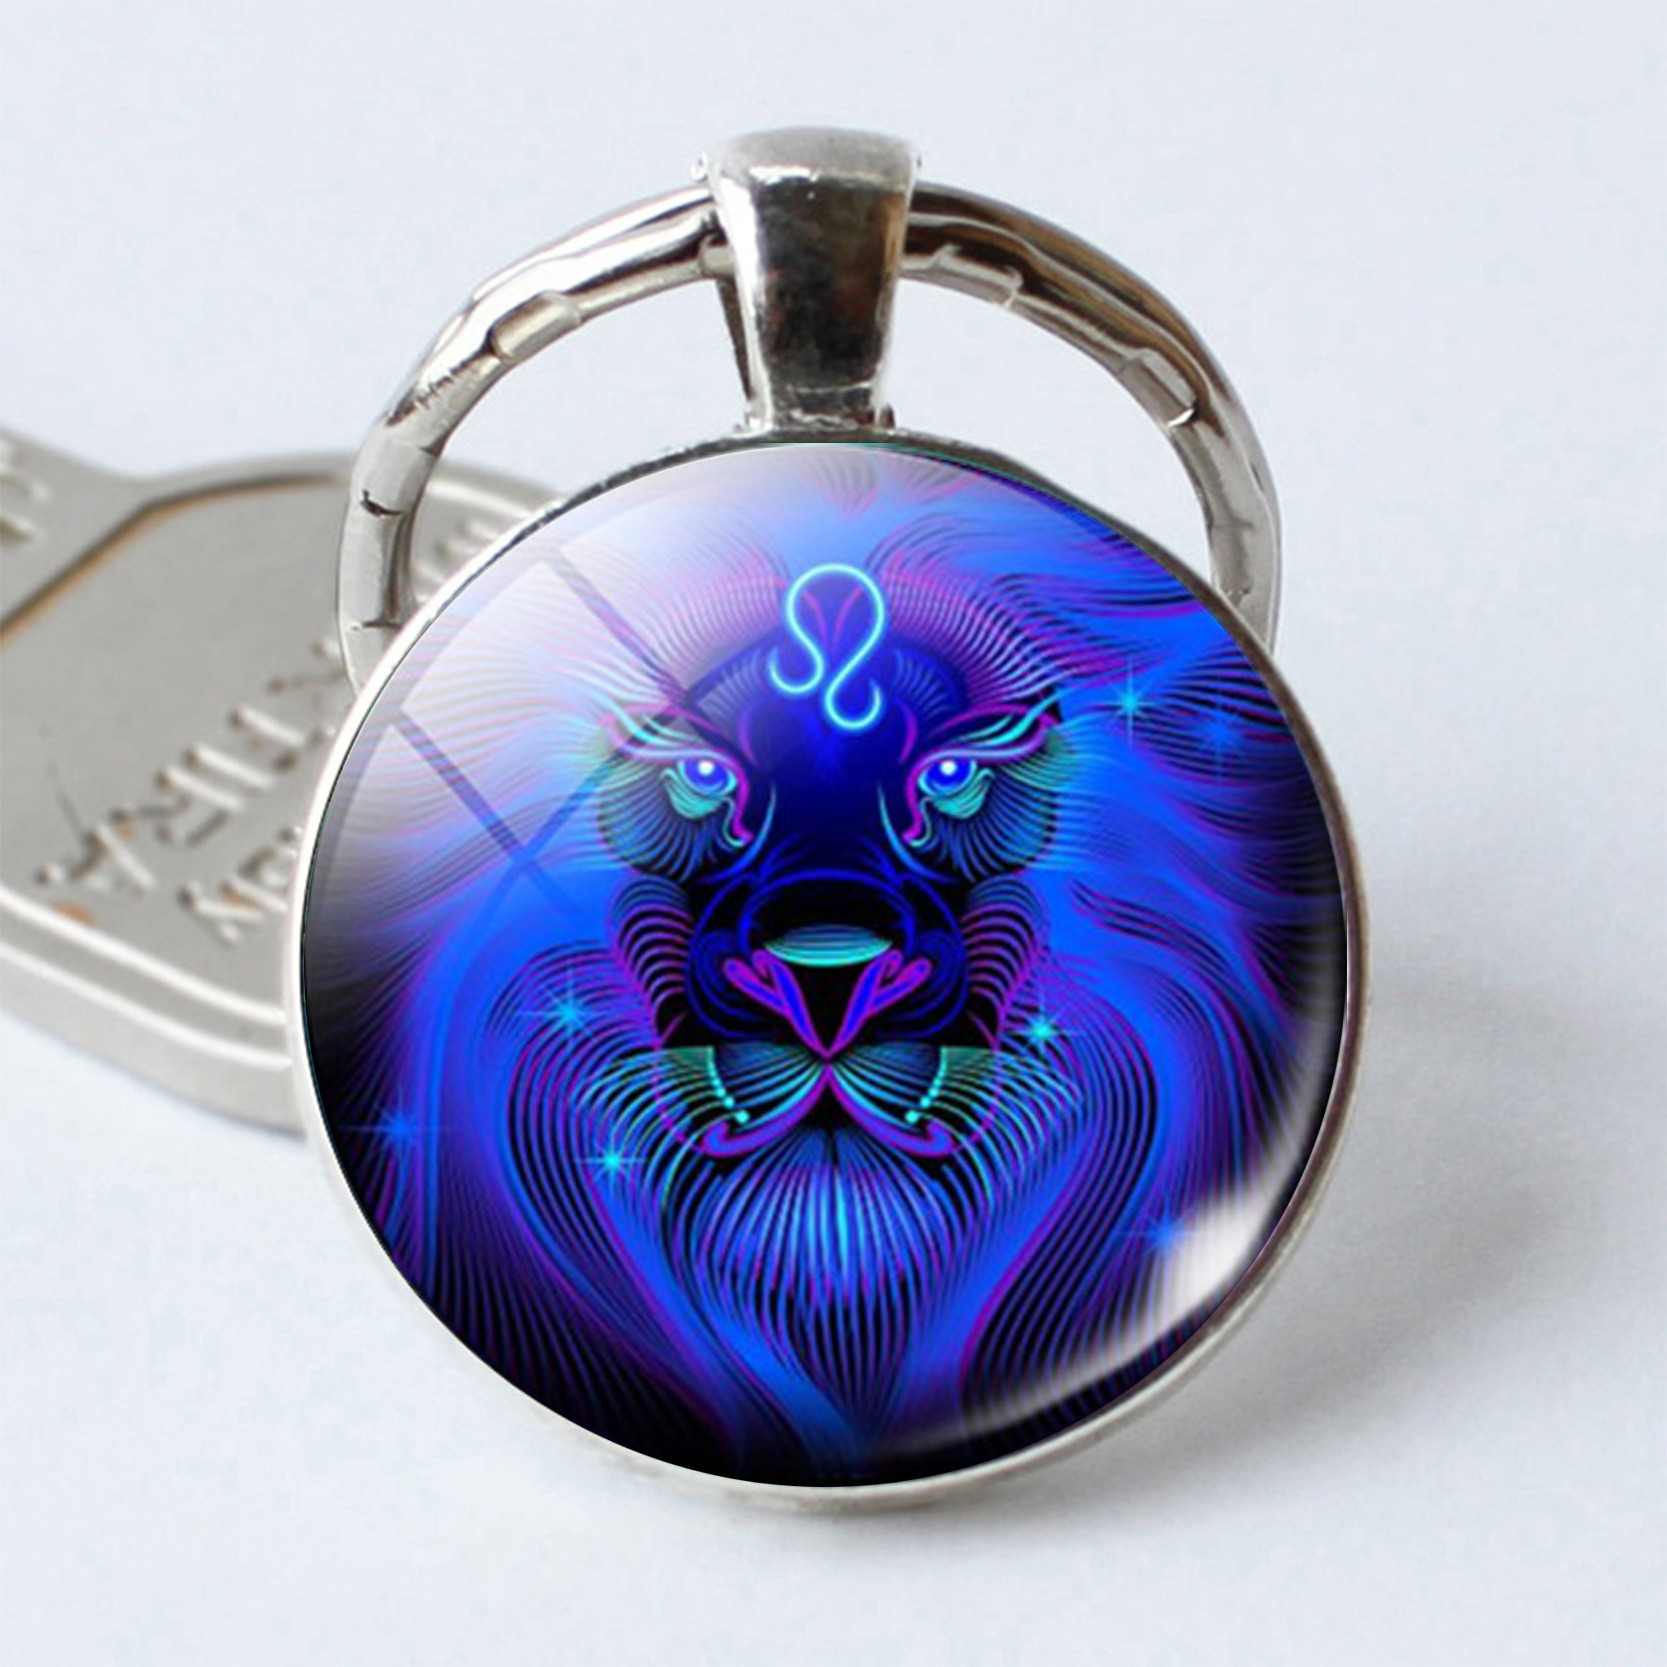 3a18f2446 dog keychain cute key ring for women puppy key chain key holder high  quality portachiavi chaveiro llaveros hombre bag charm